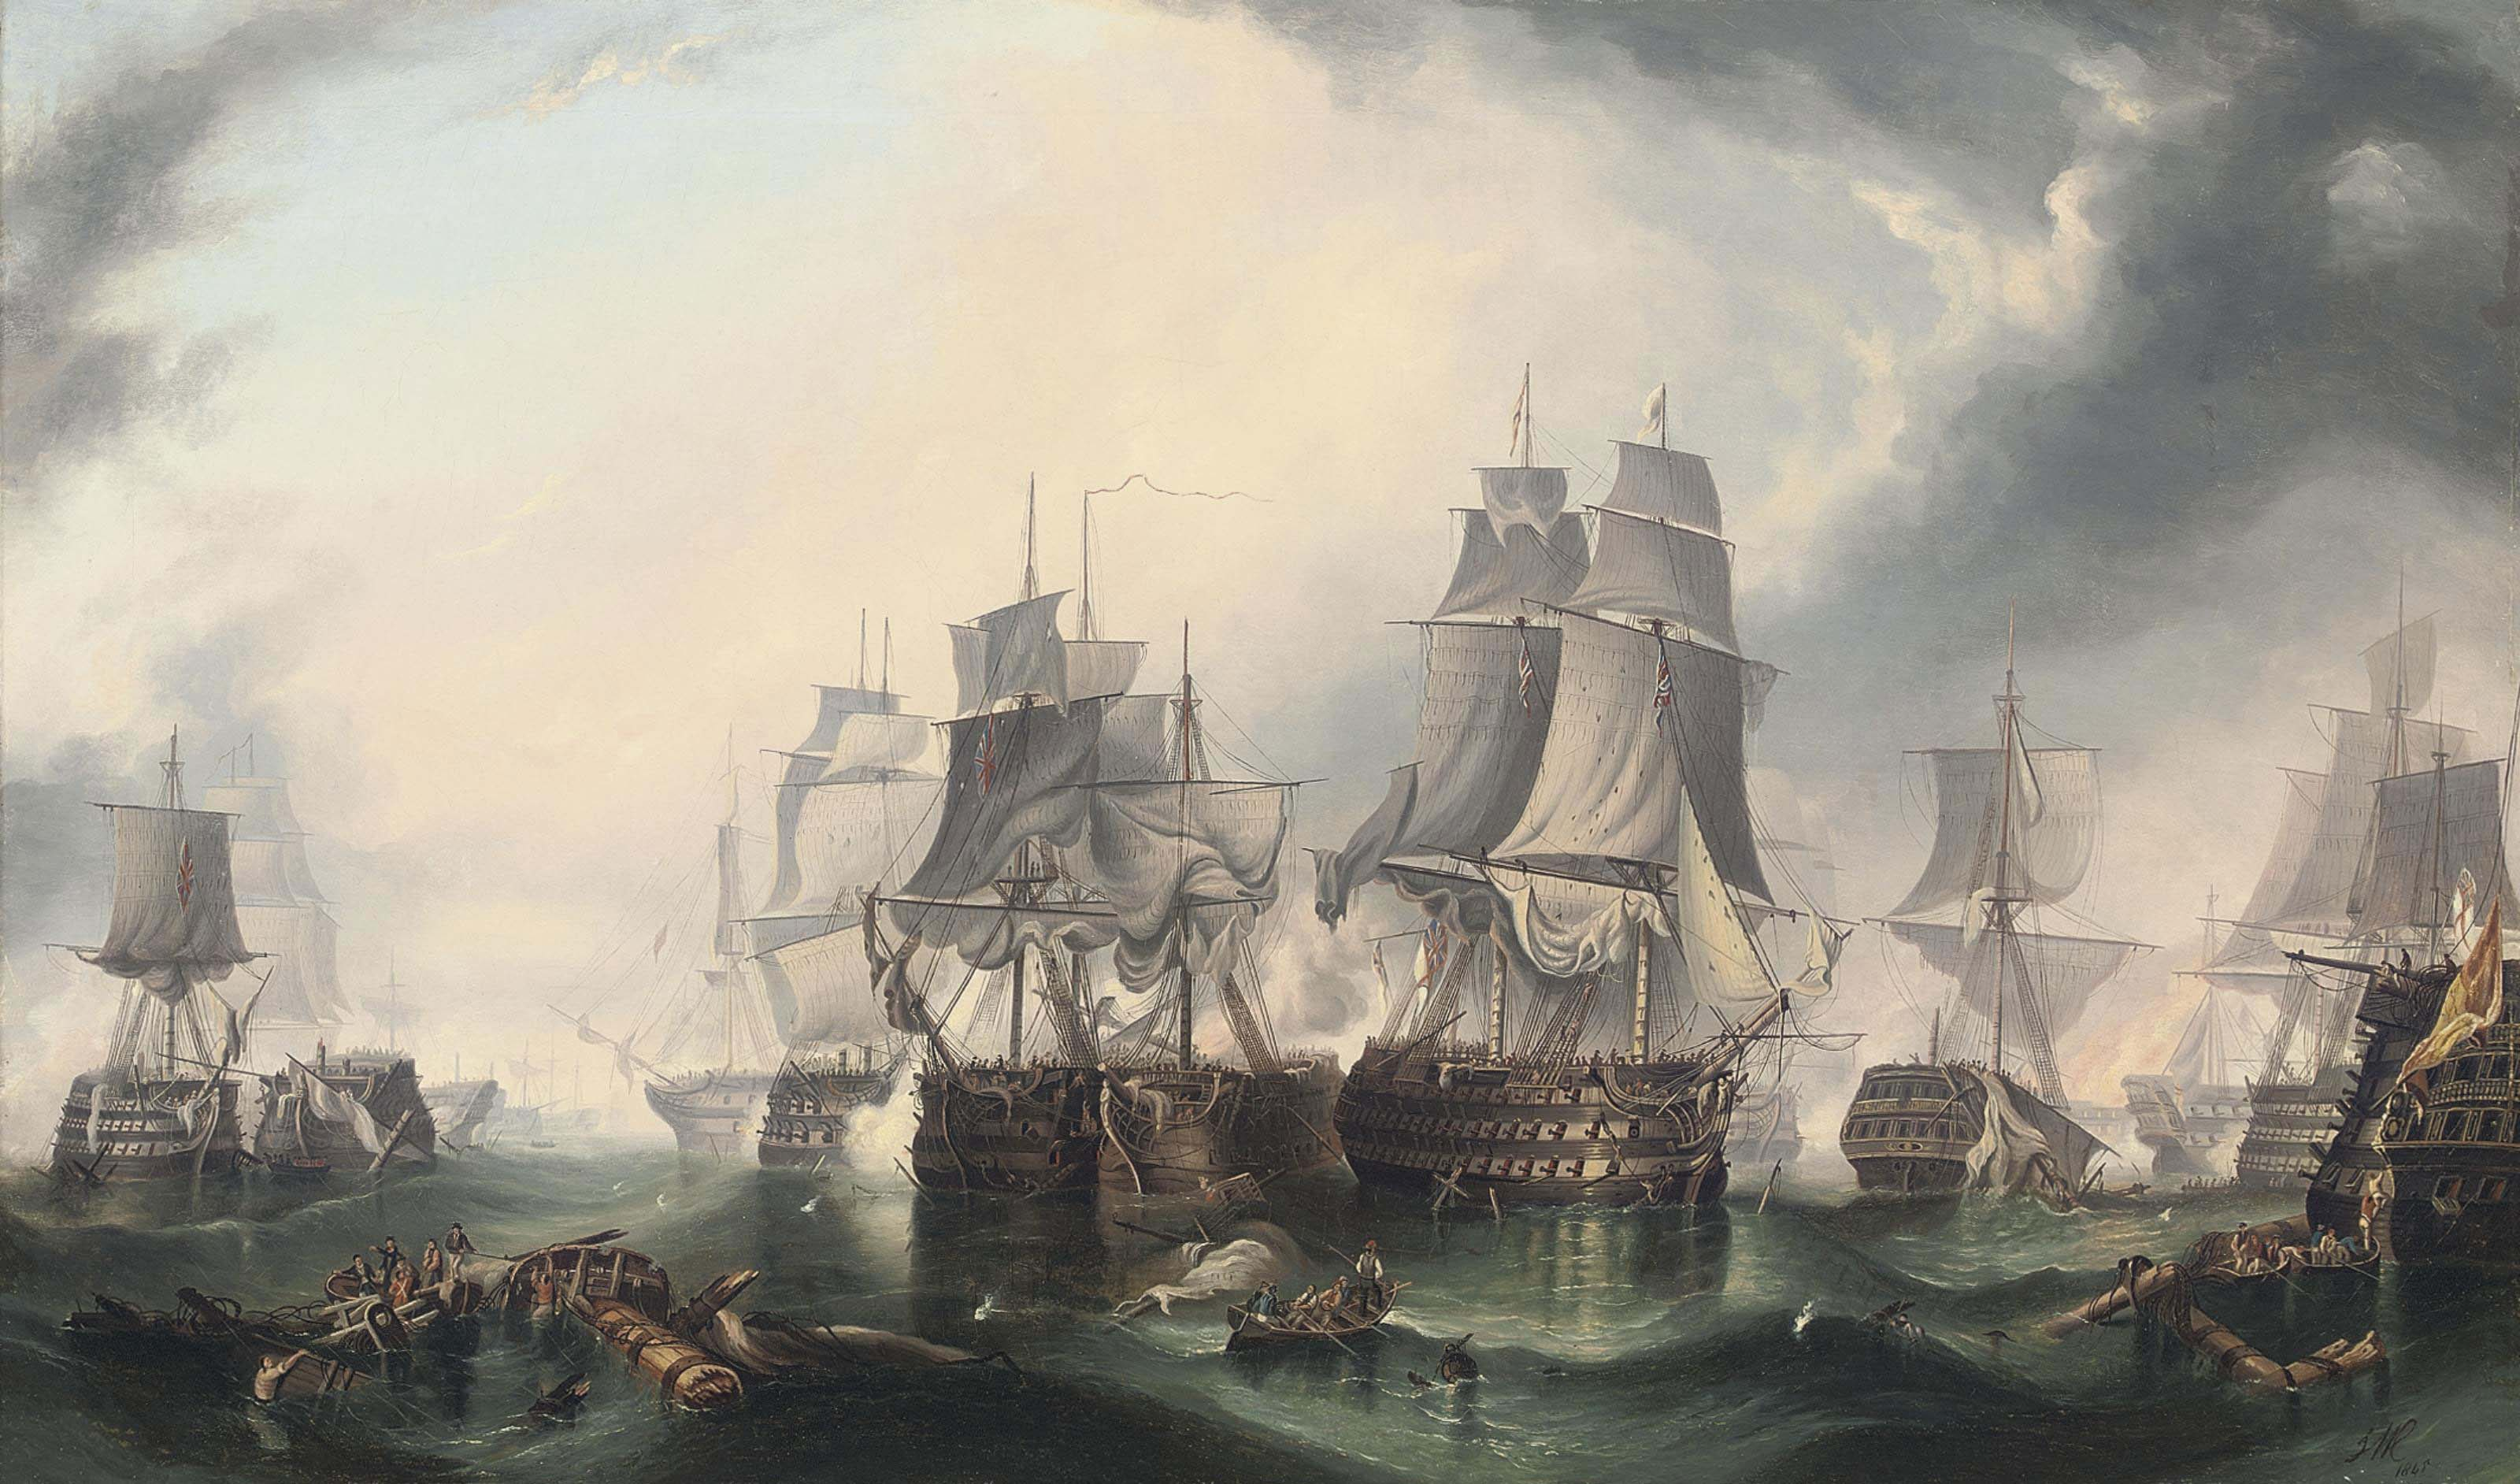 Trafalgar, in the heat of battle, 21st October 1805